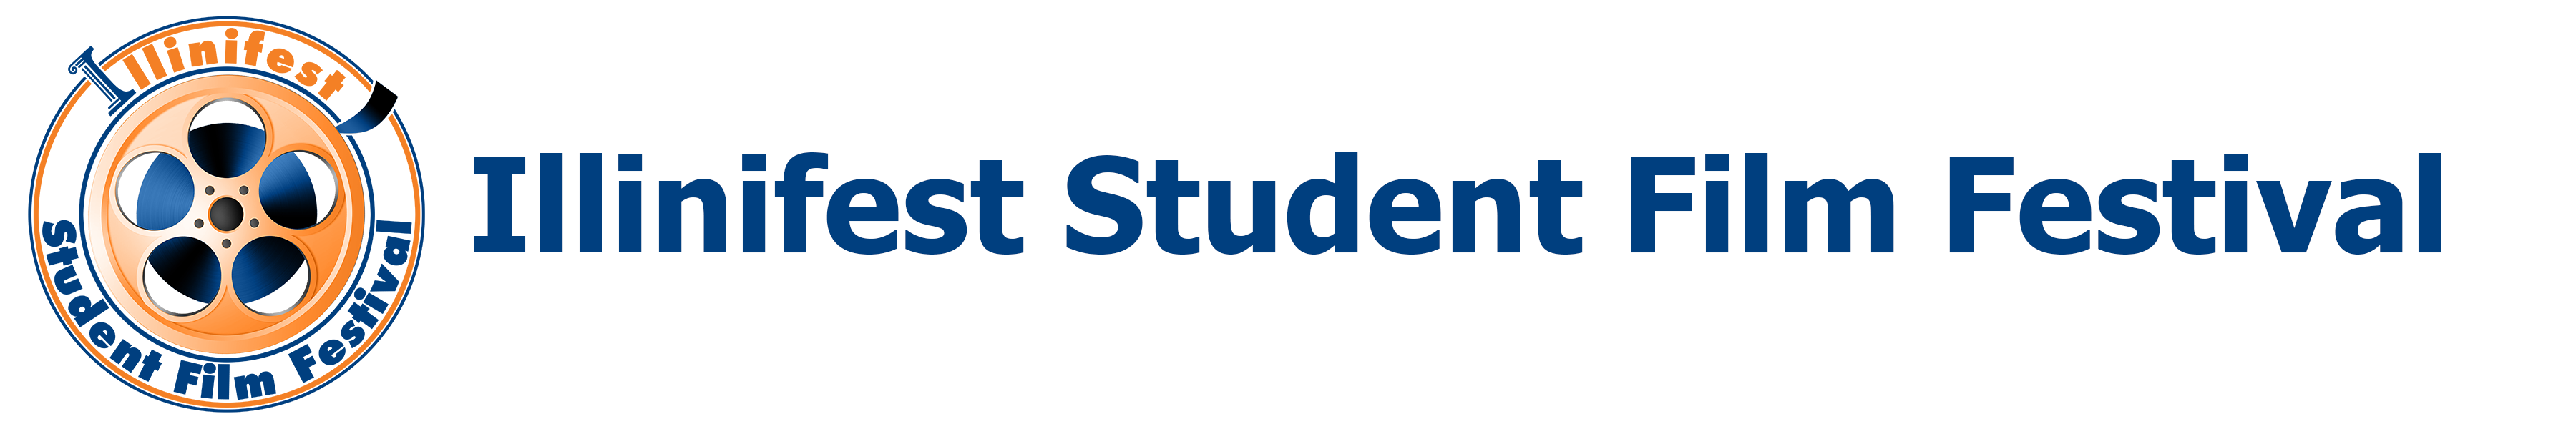 Illinifest Student Film Festival logo